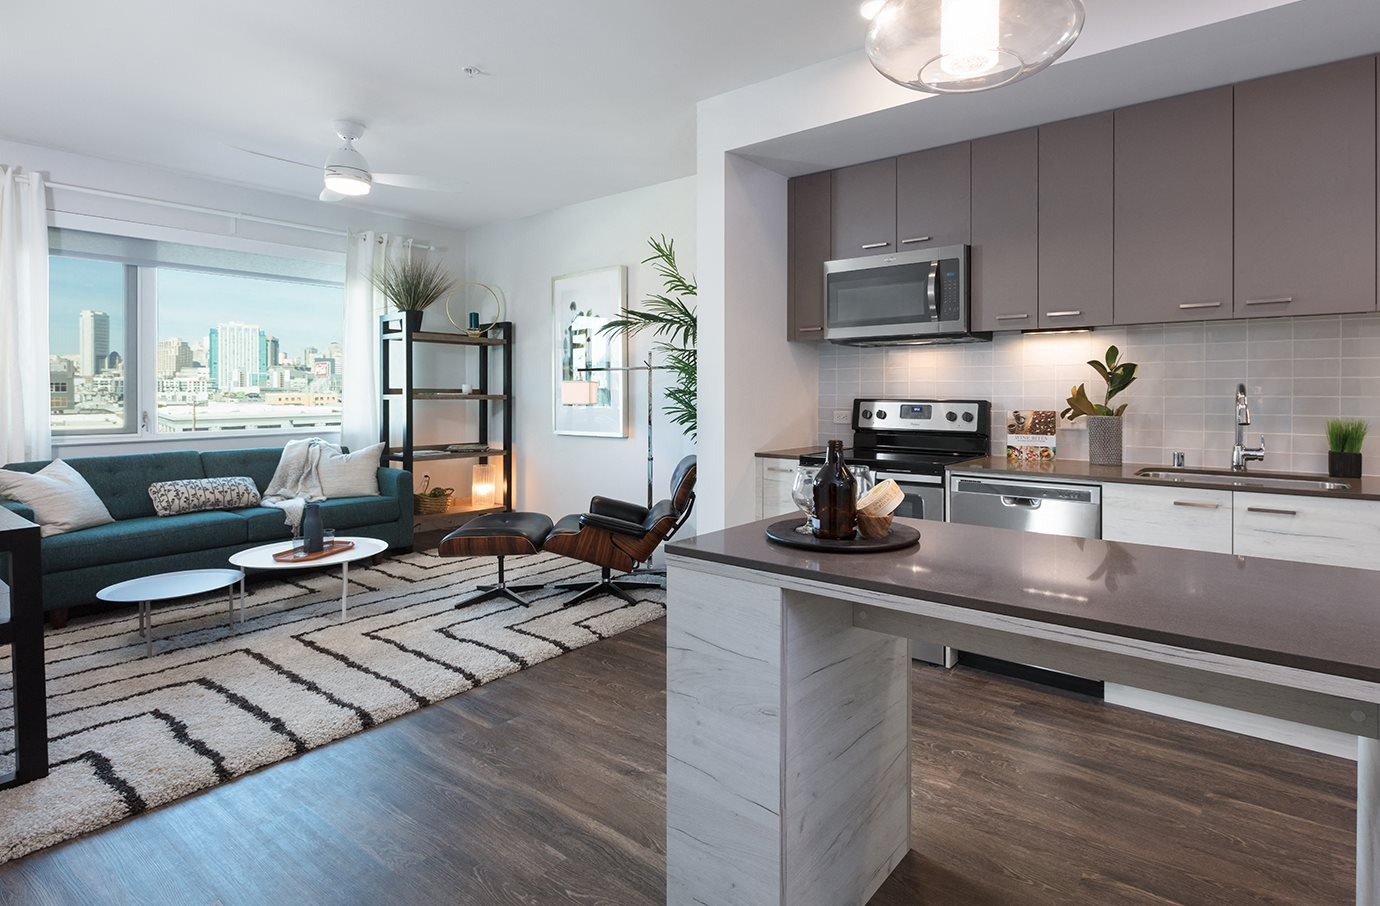 Modern Kitchen at Mission Bay by Windsor